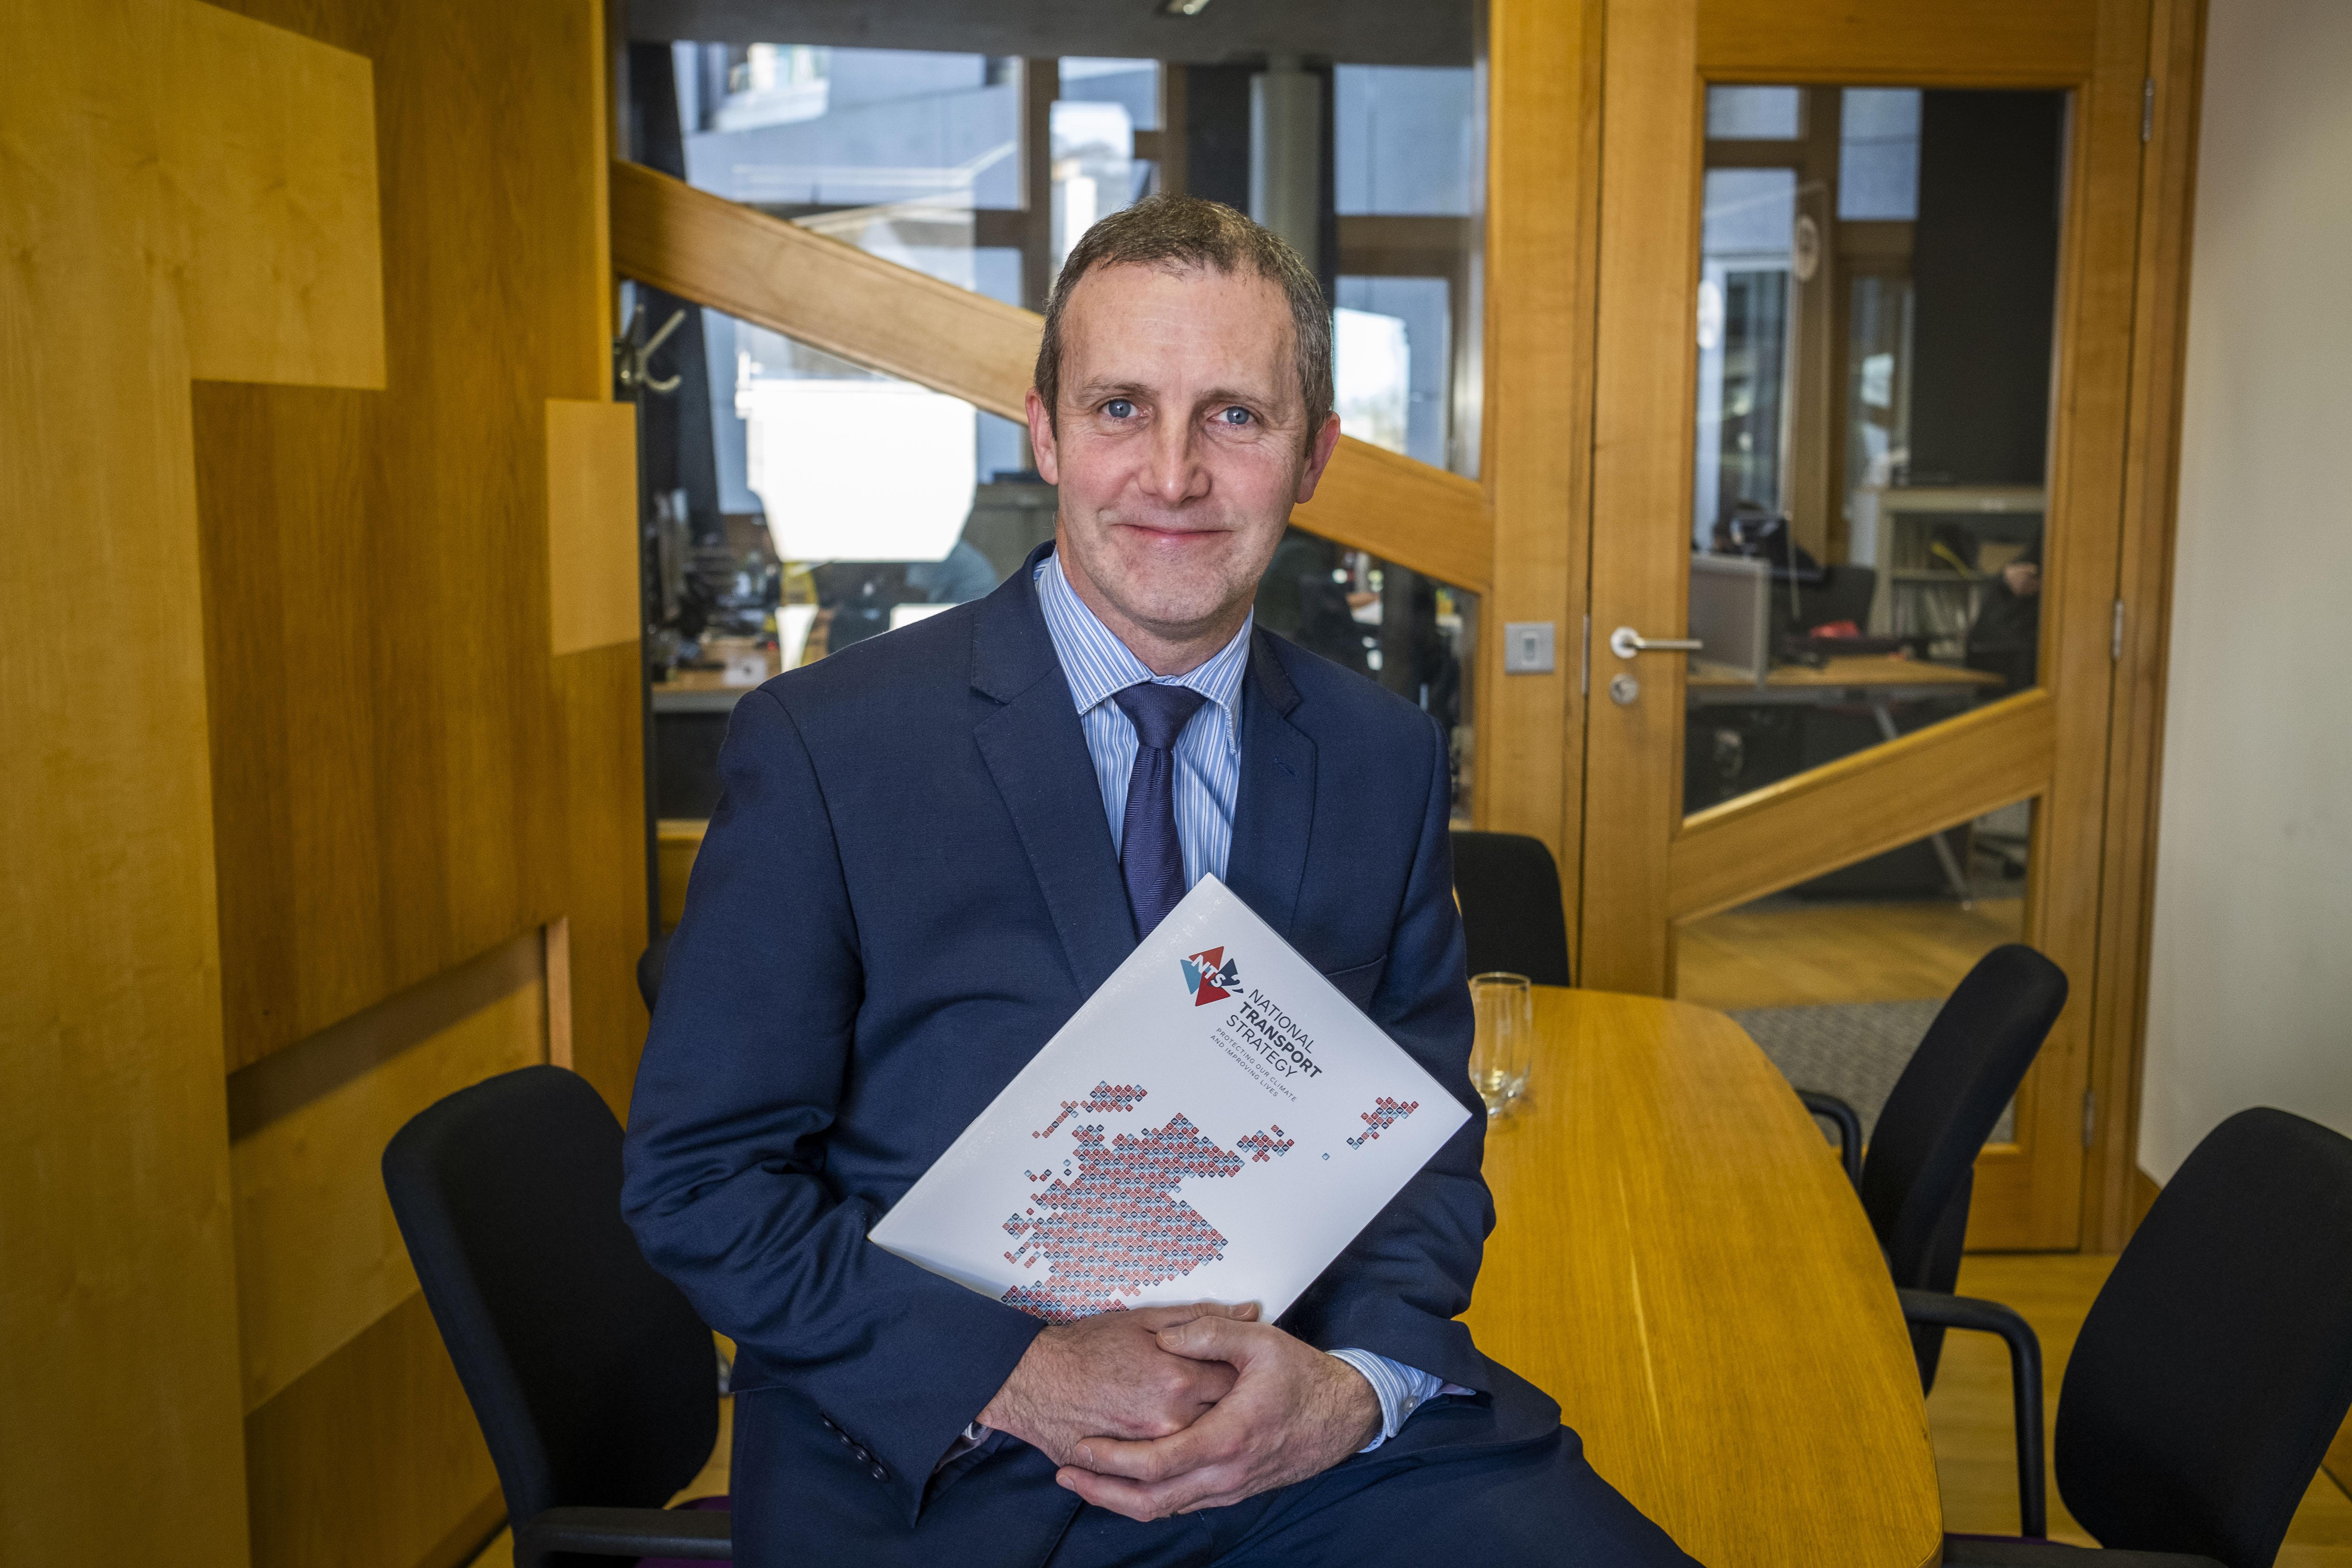 Scotland to encourage public transport use post-pandemic